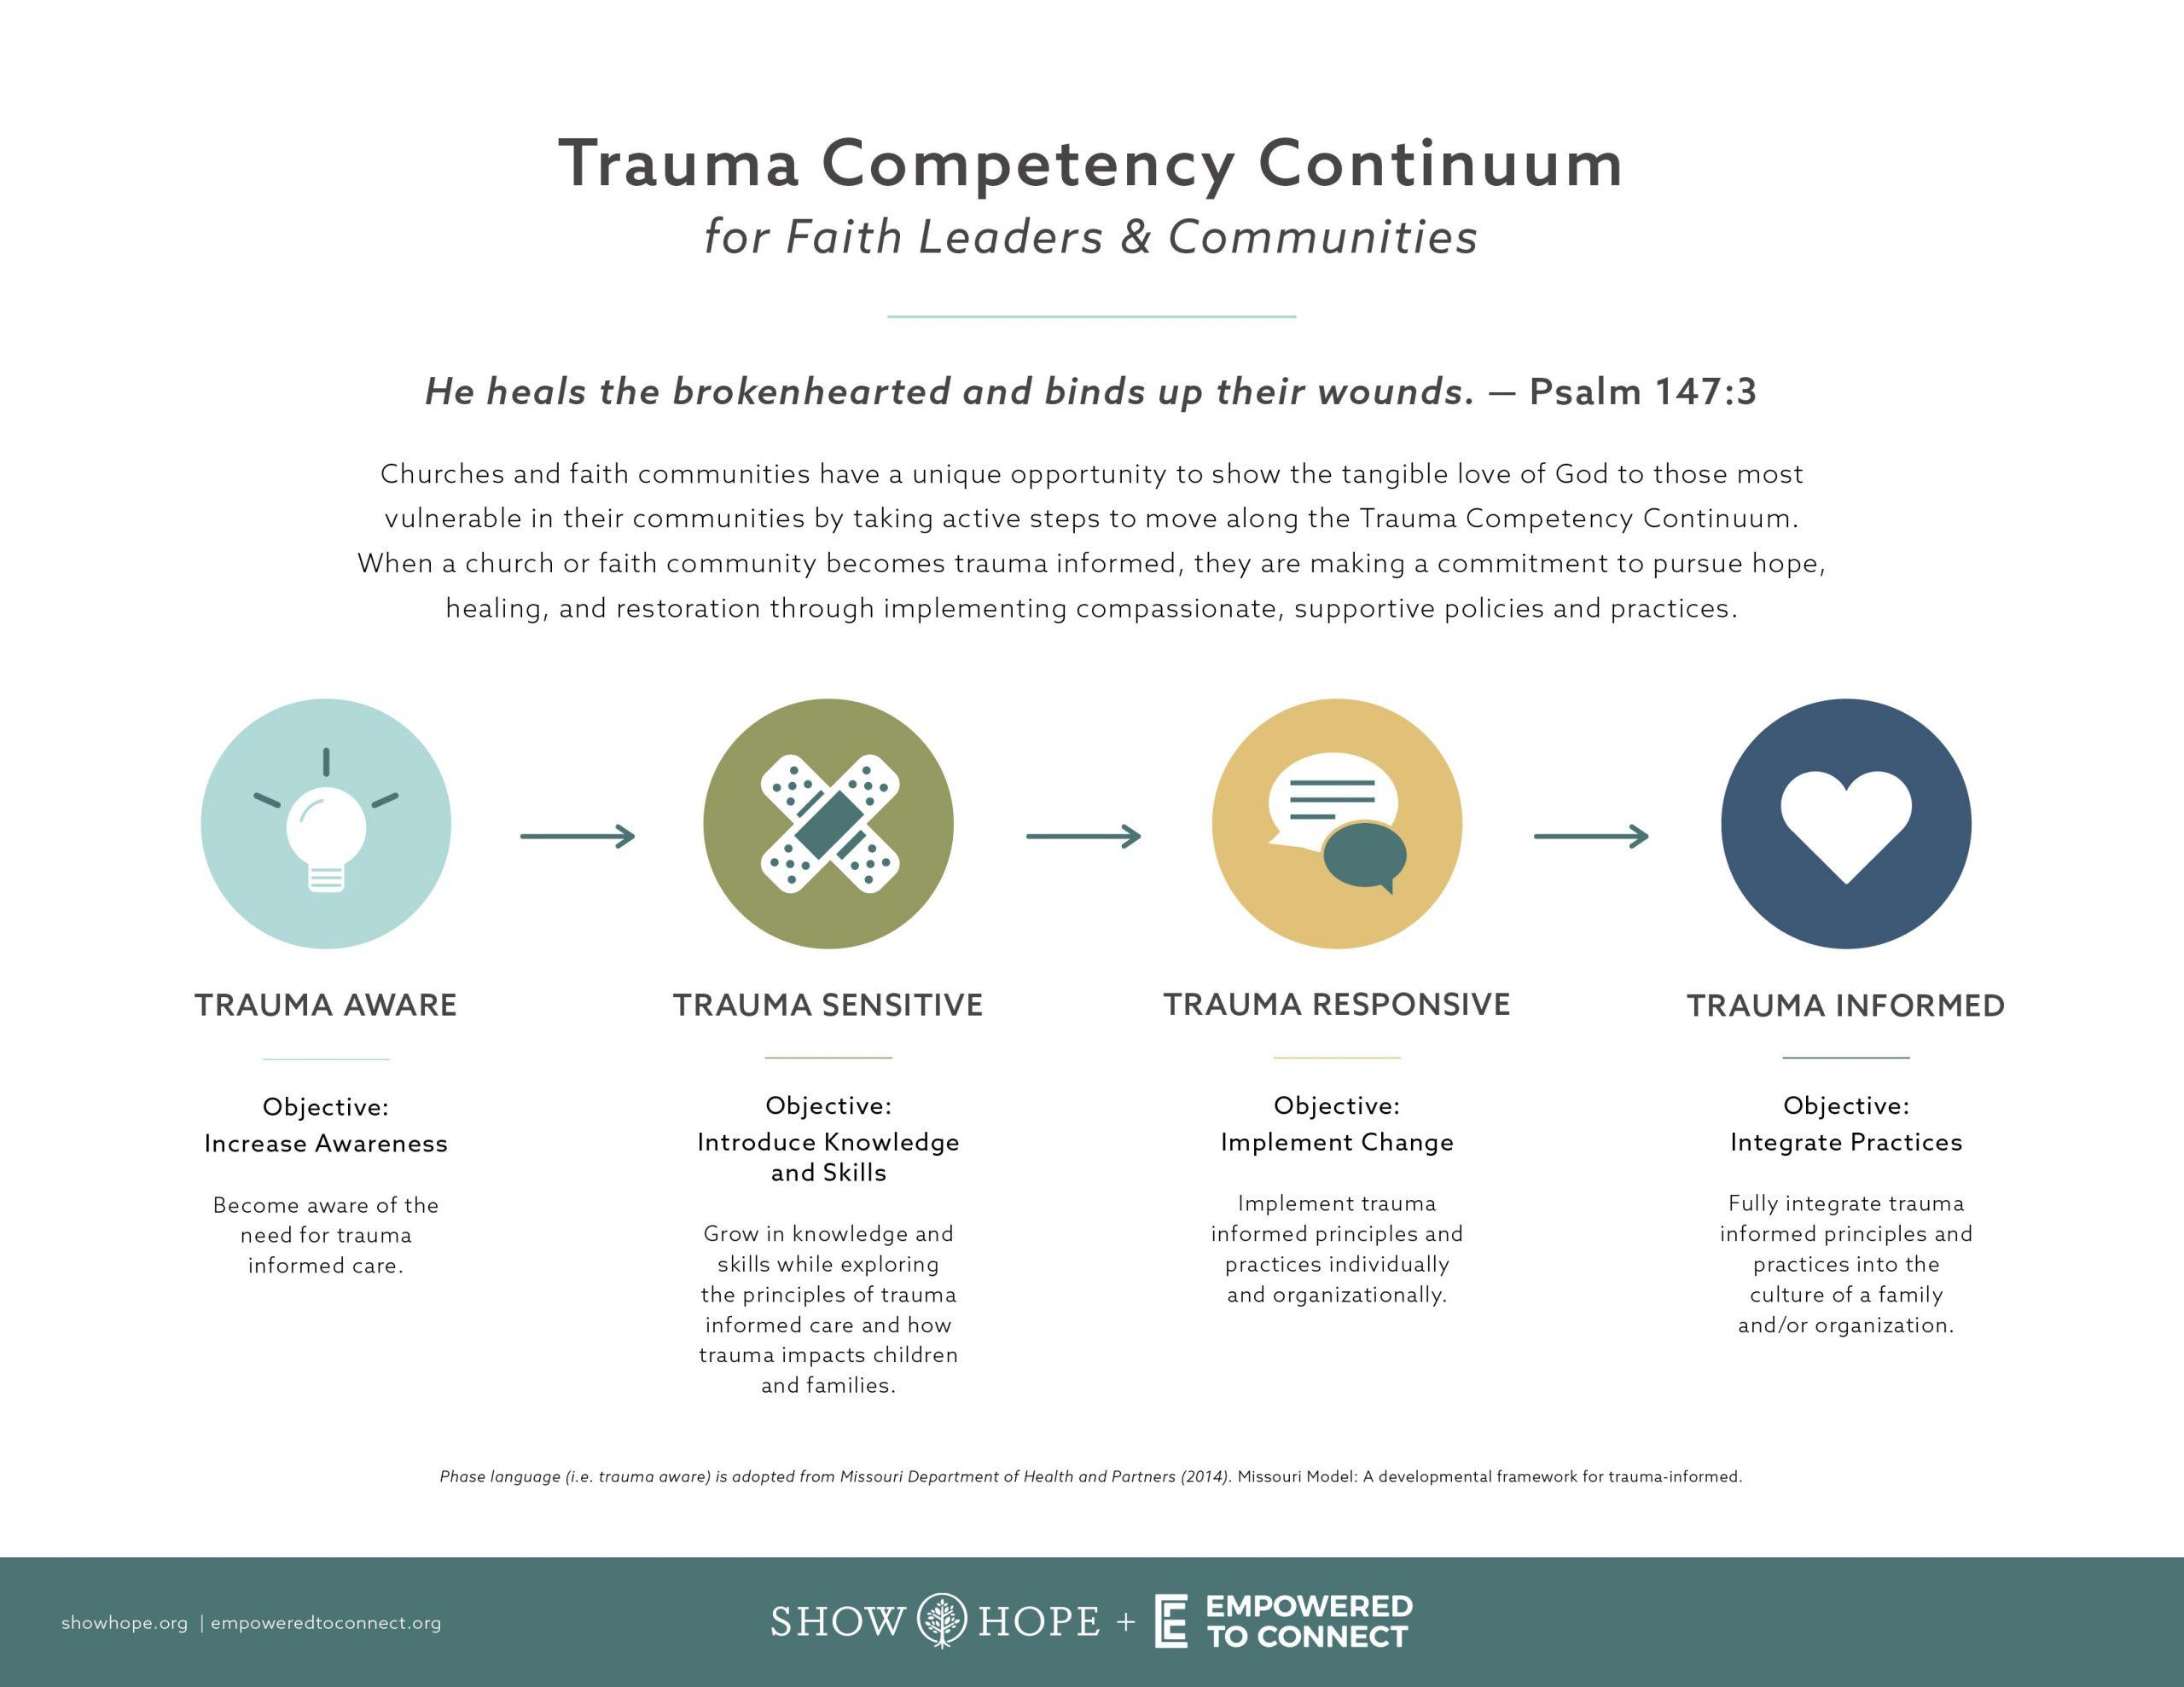 TraumaCompetencyContinuum